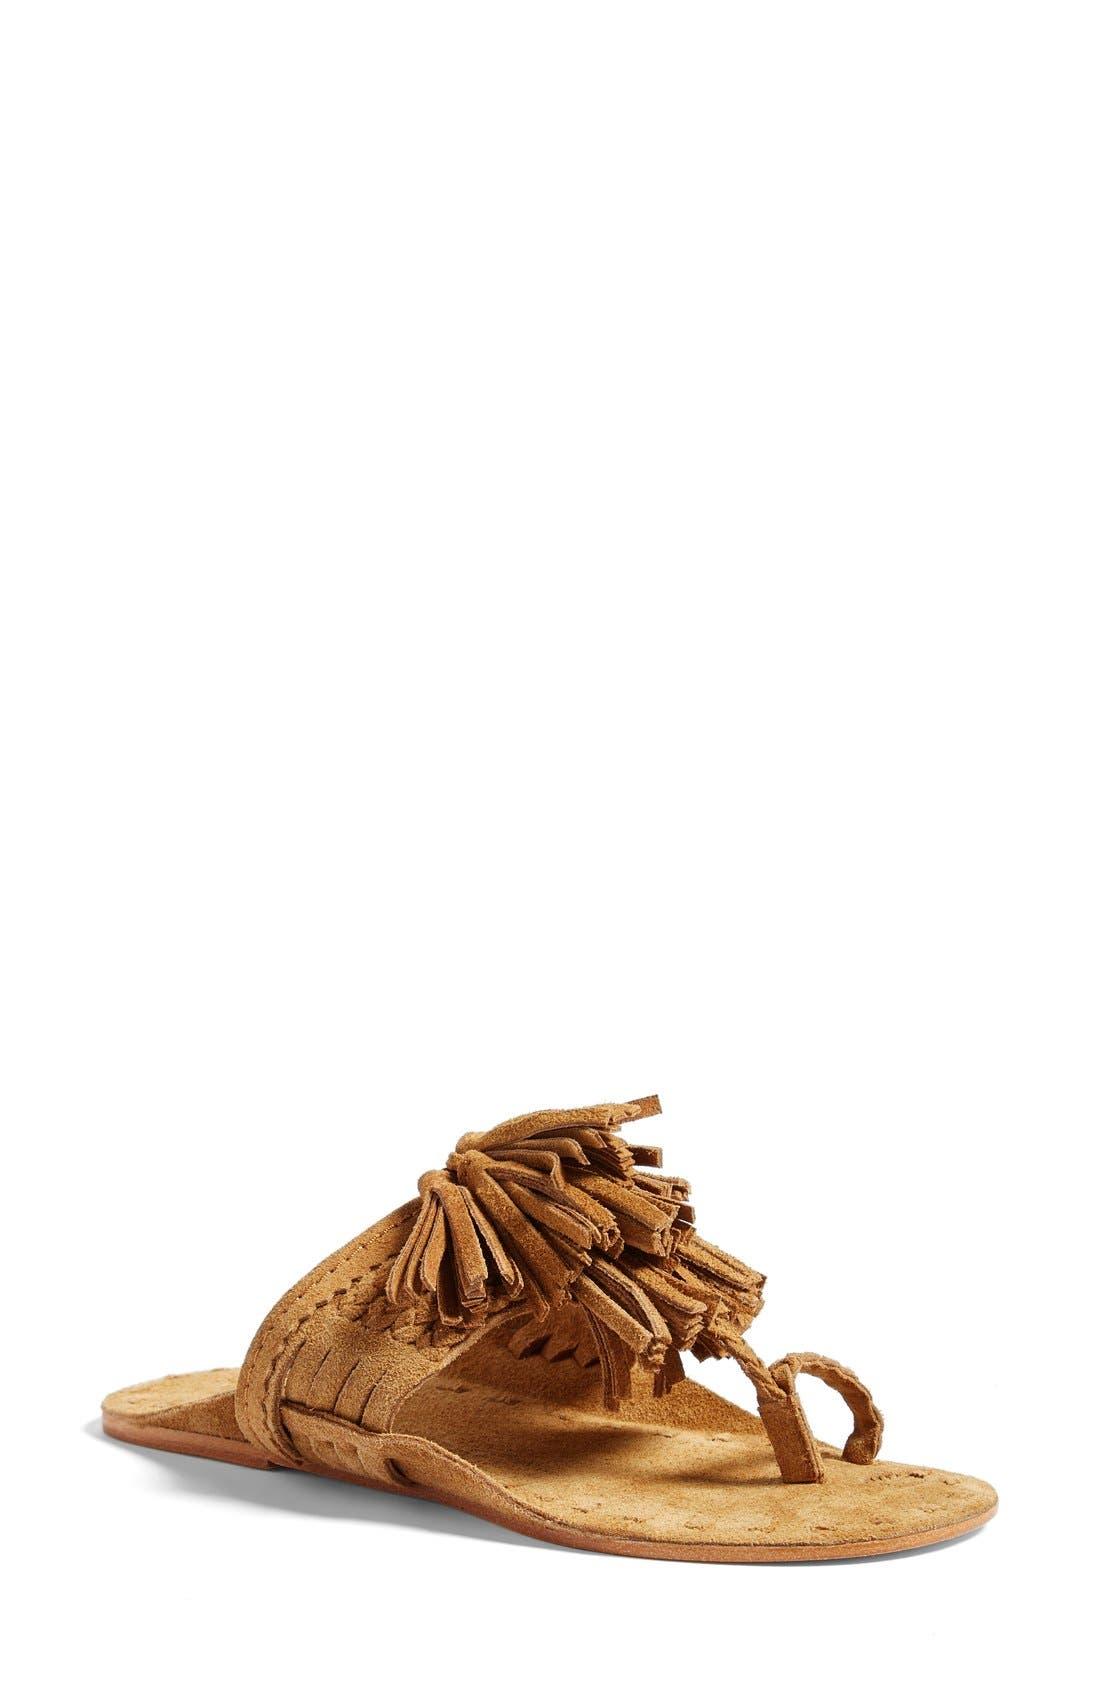 Scaramouch Tassel Sandal,                         Main,                         color, 200